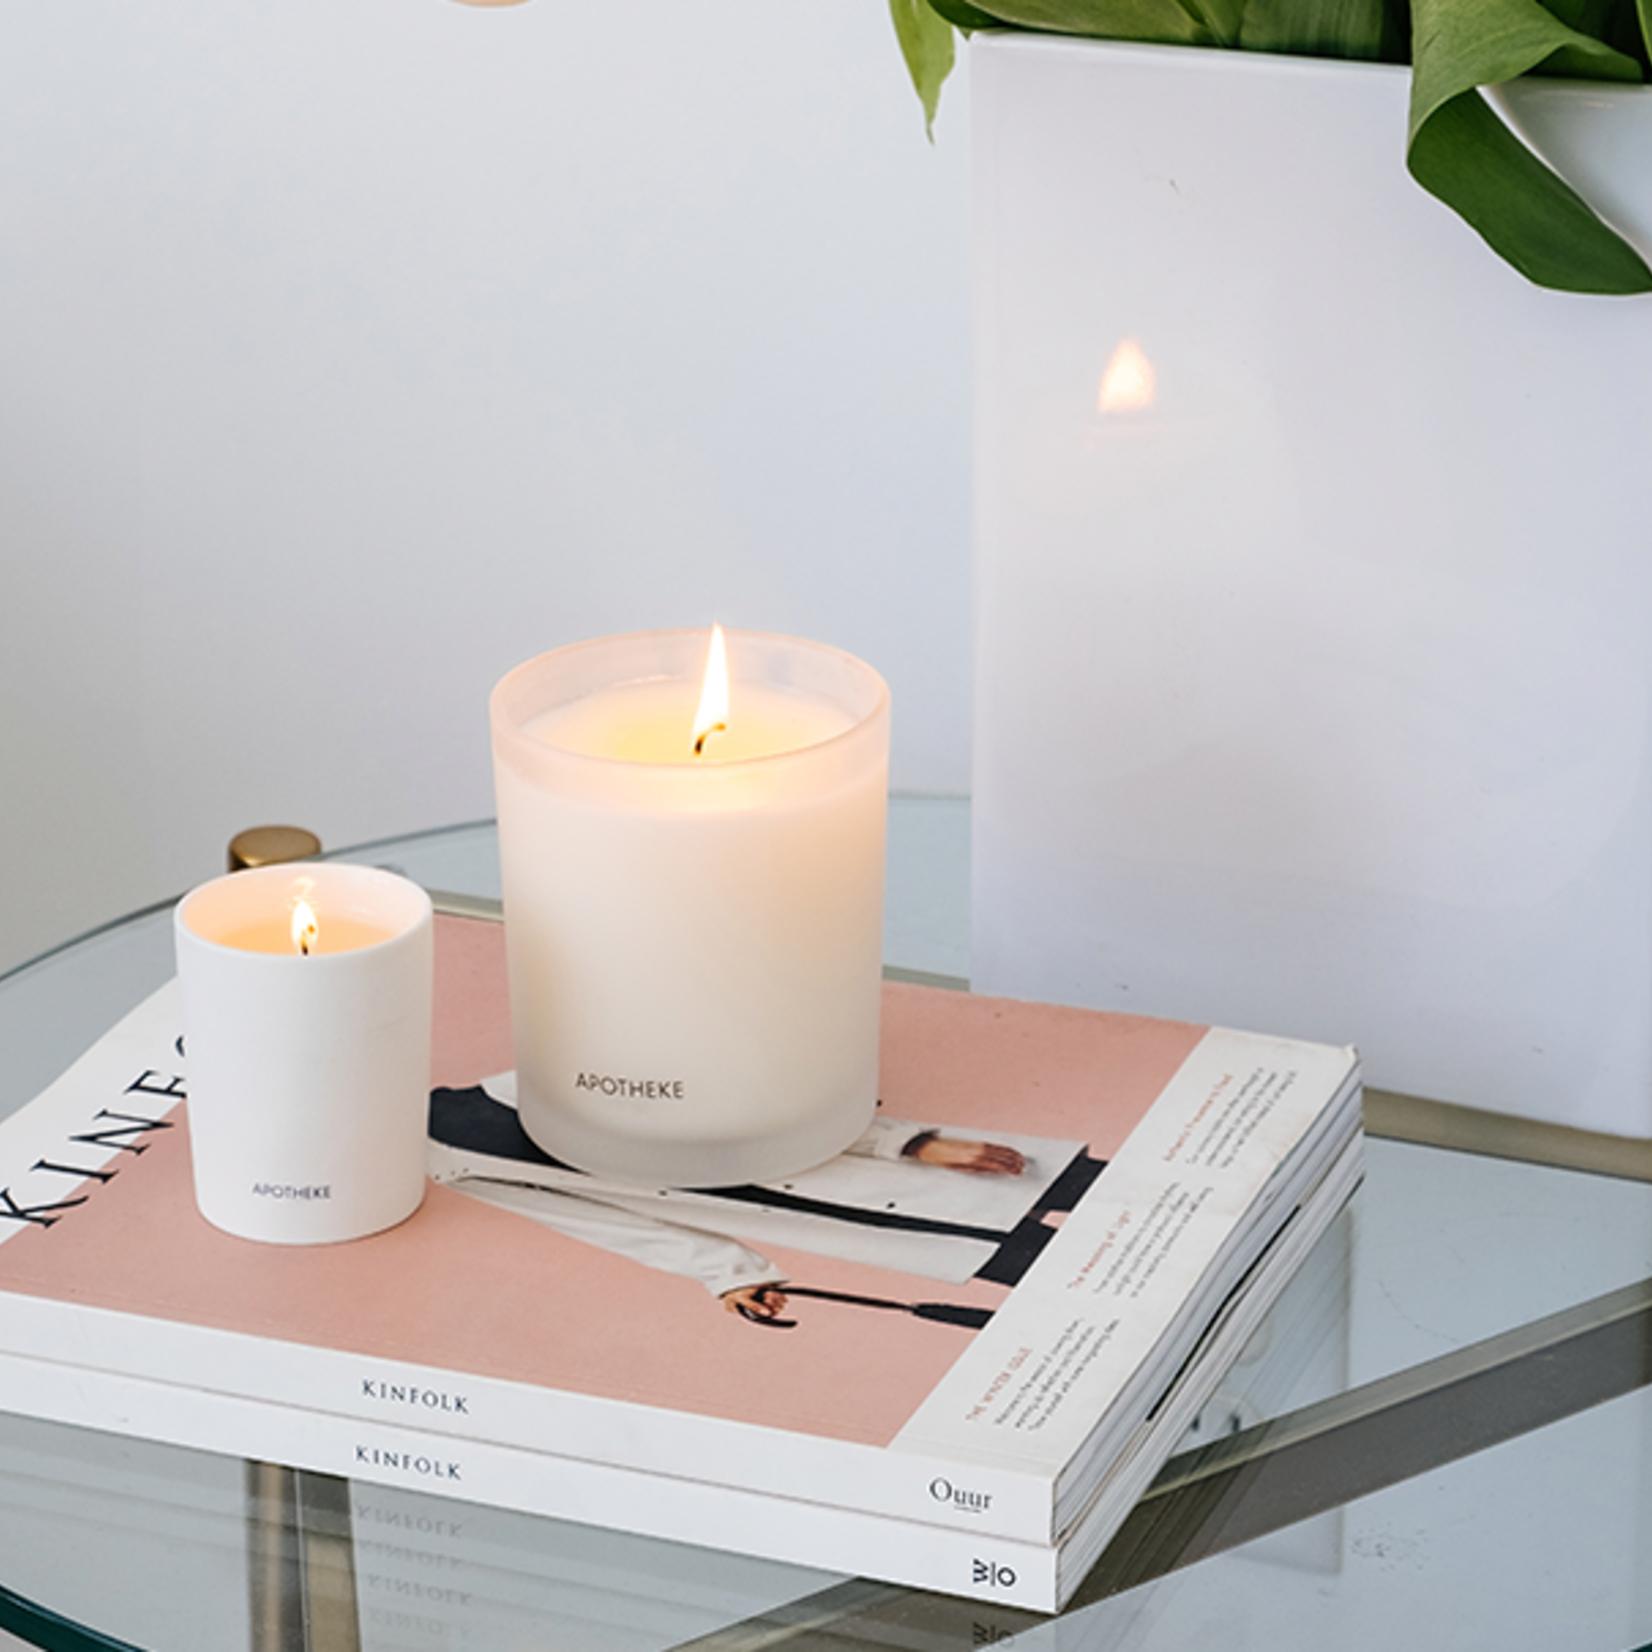 Apotheke White Vetiver Signature Candle